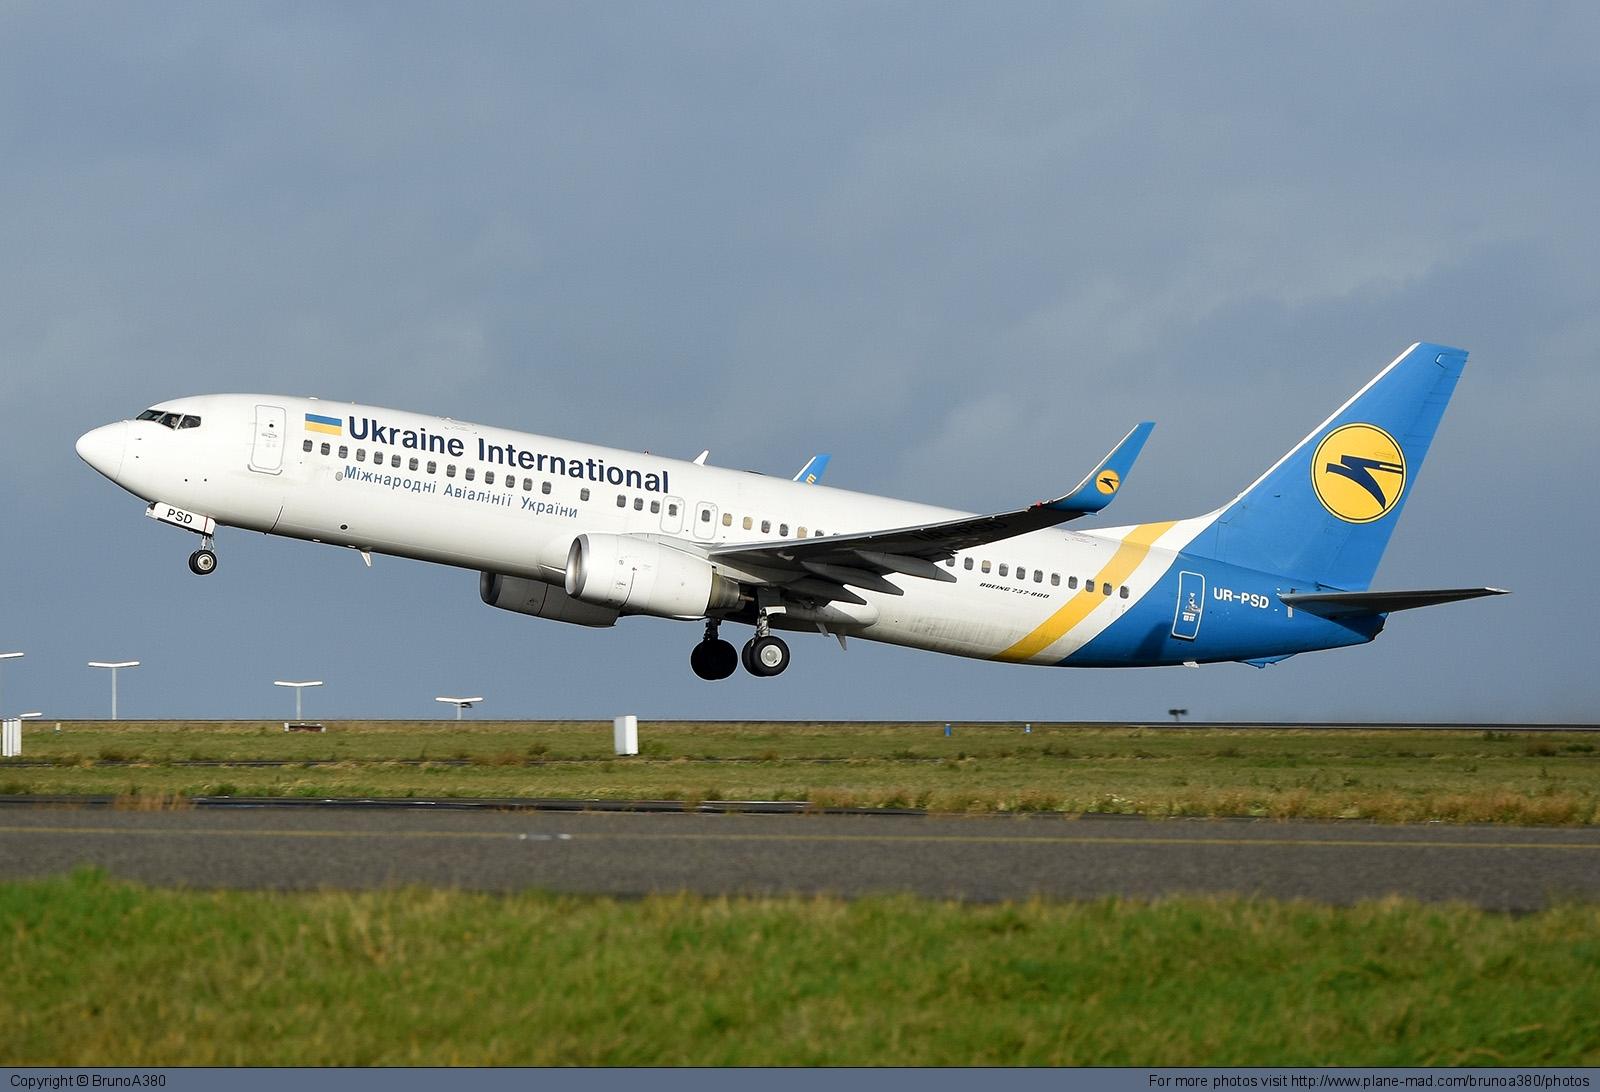 Boeing zacikavlenyj u spivpraci z Ukraїnoju: provely peršyj etap peregovoriv